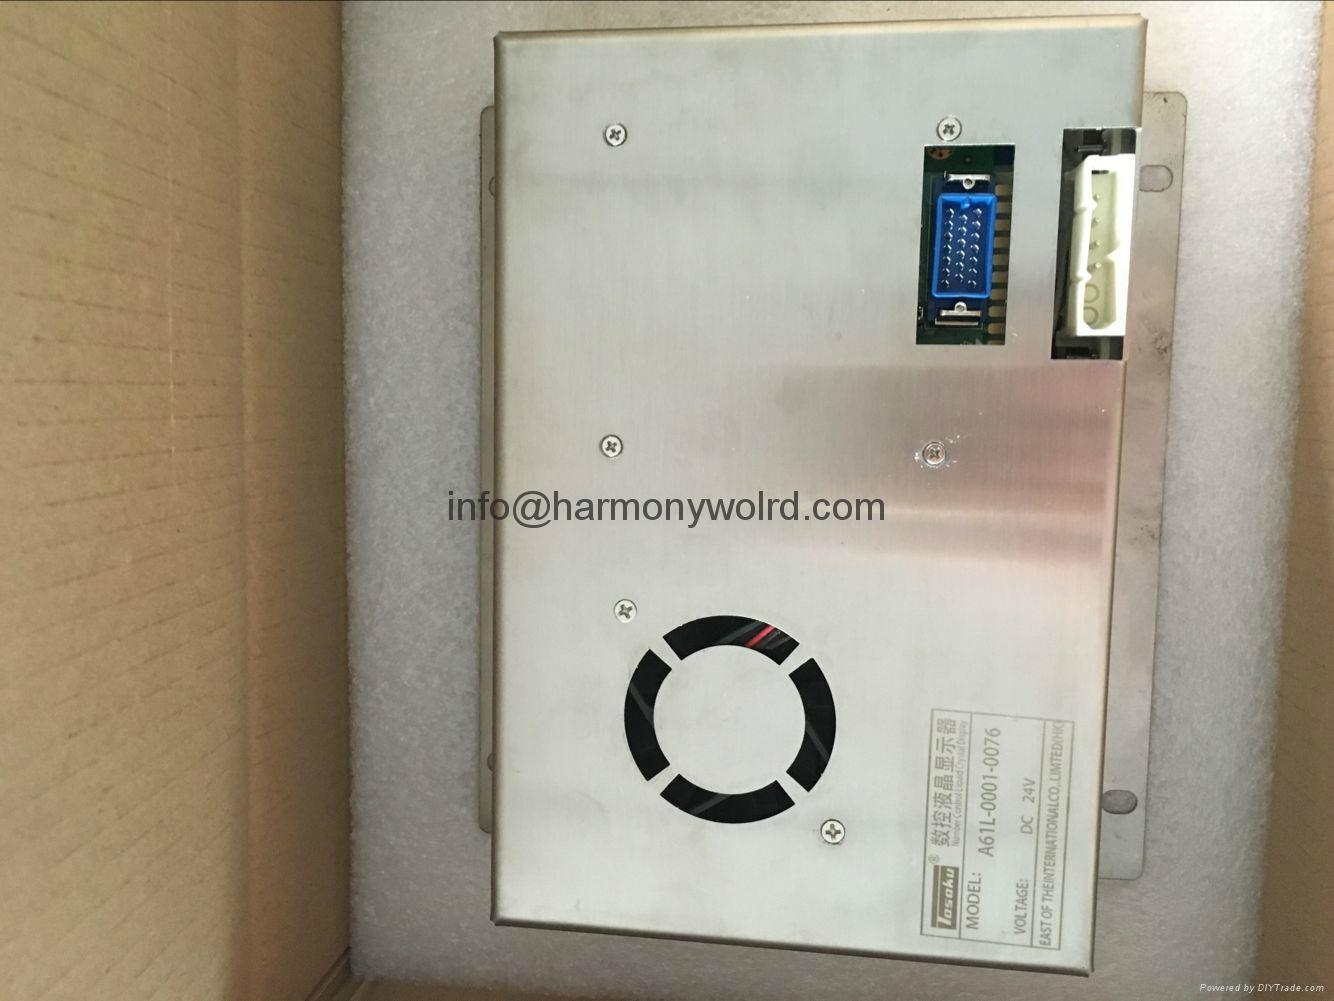 Upgrade A02B-0120-C071/MA Fanuc Monitors A02B-0163-C322 A02B-0163-C341  16